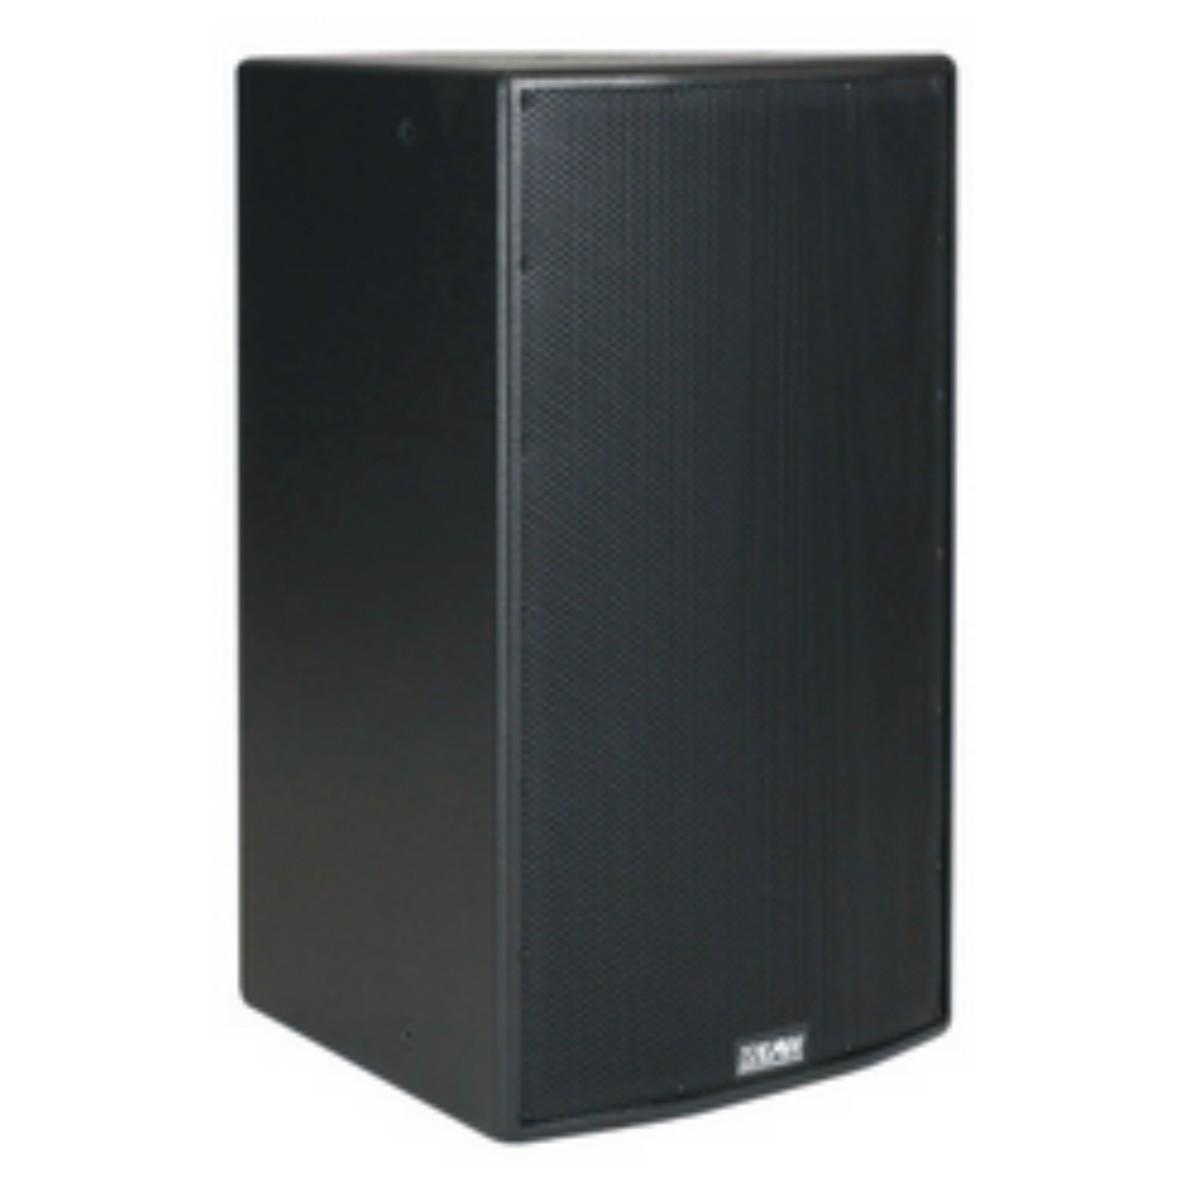 MK5394i 二分频高输出梯形音箱